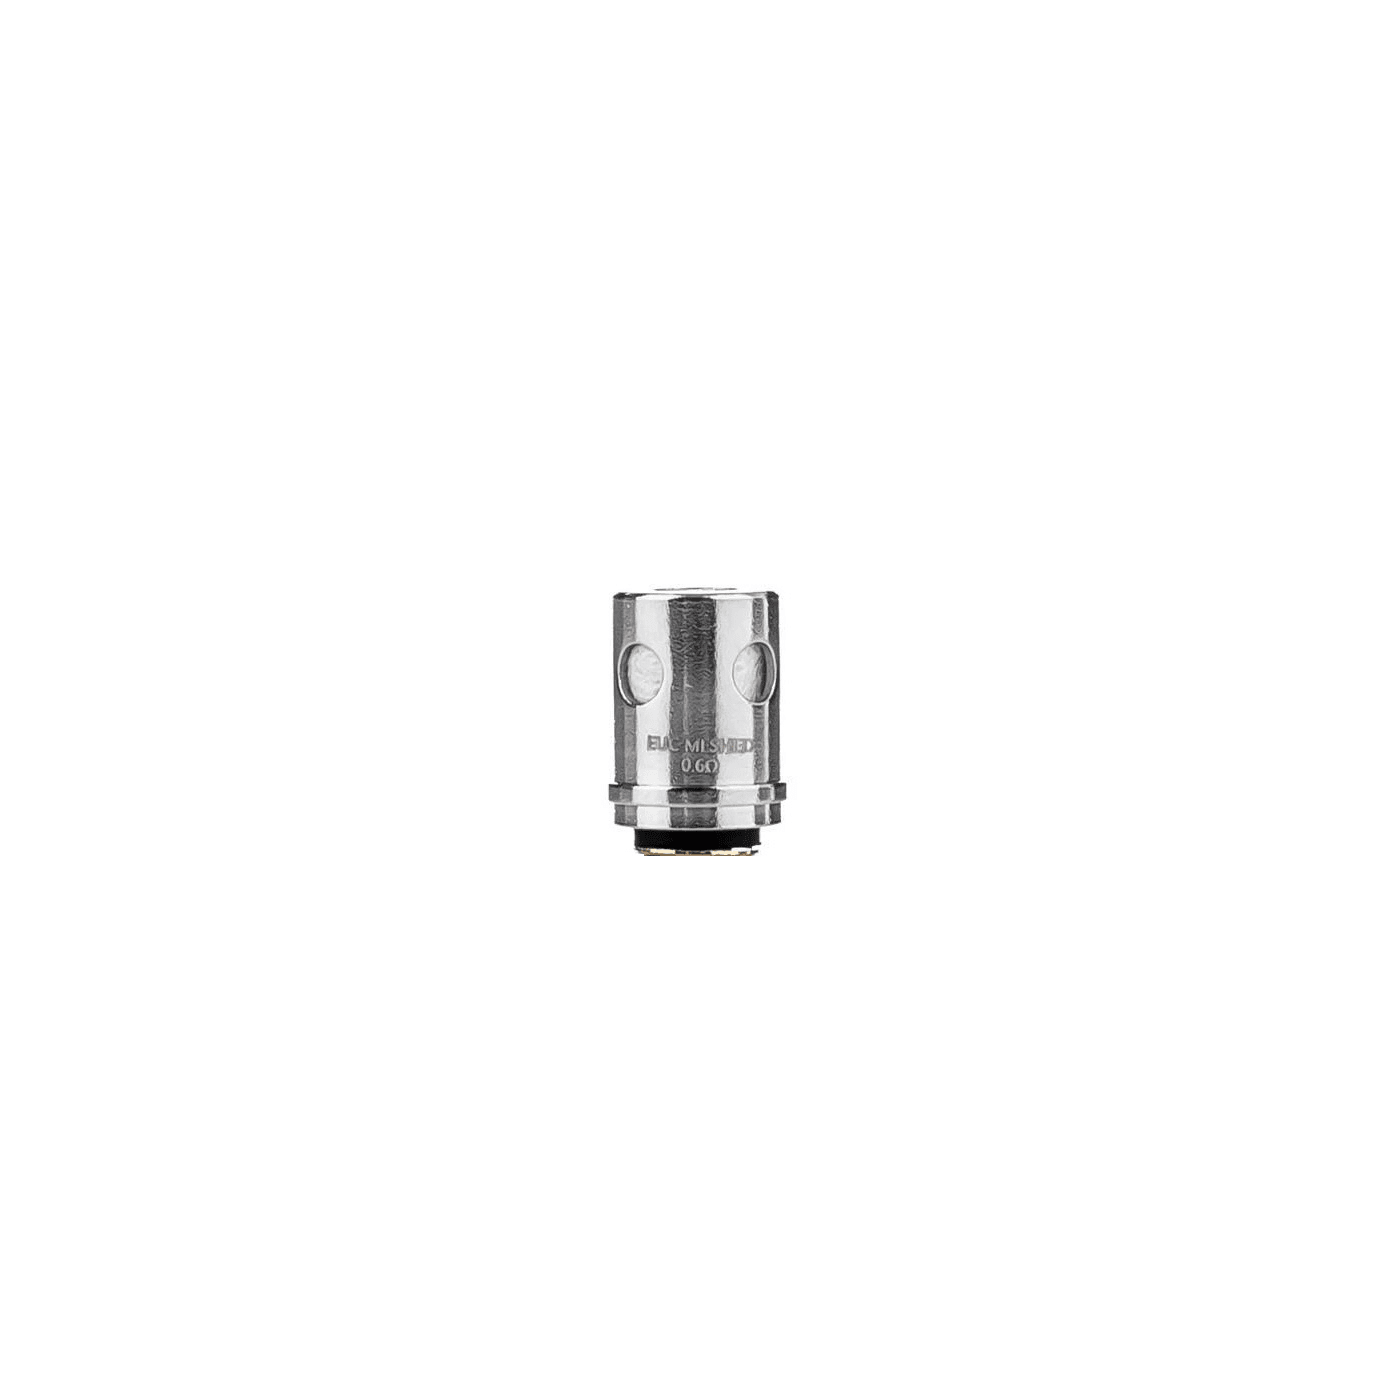 Vaporesso EUC Mesh Replacement Coil - 5 Pack